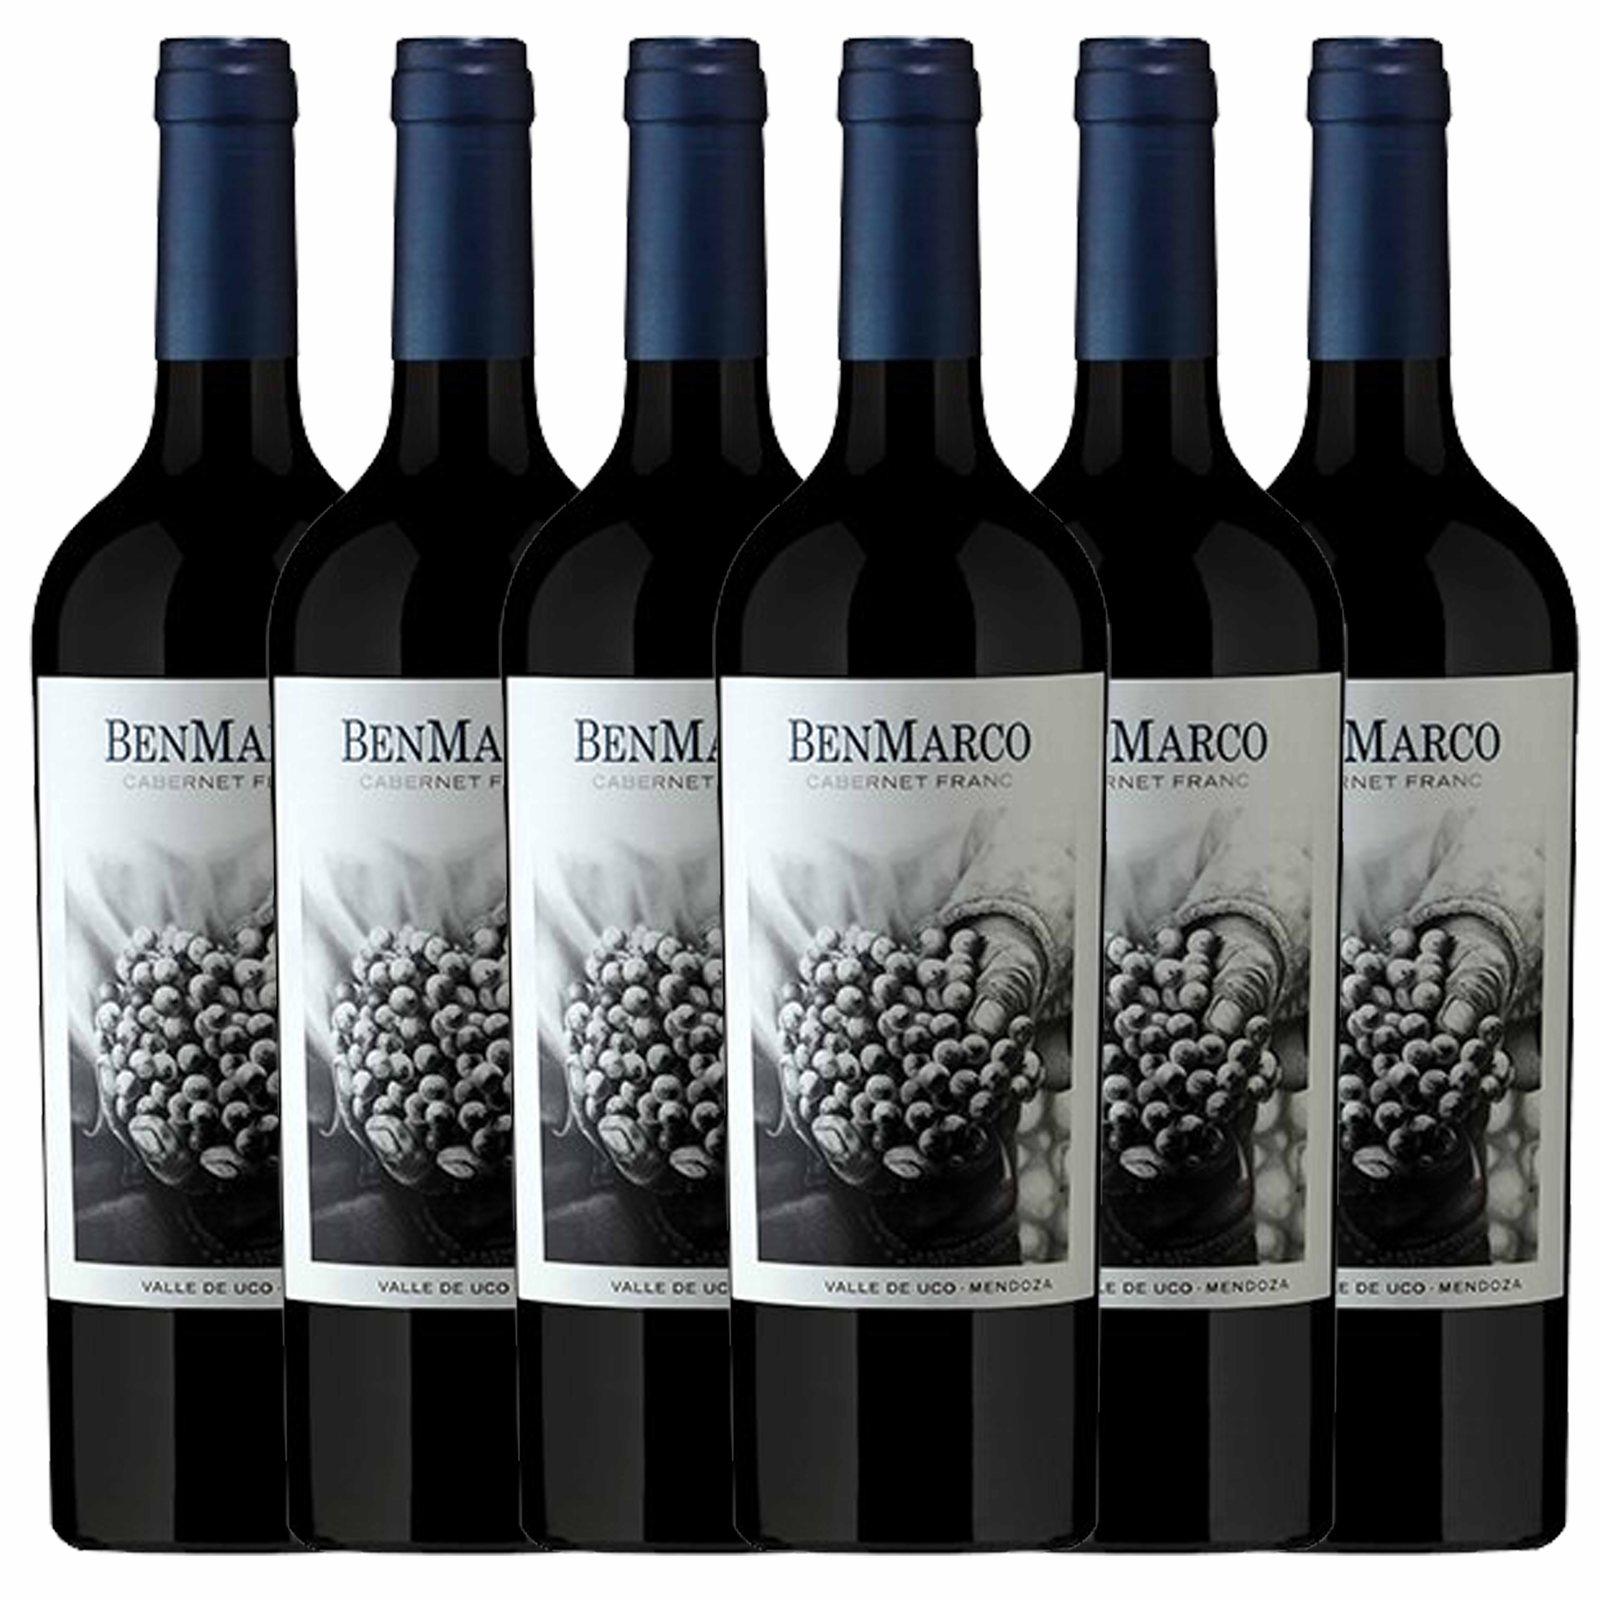 Kit 6x Vinho Tinto Argentino Benmarco Cabernet Franc 2018 750ml